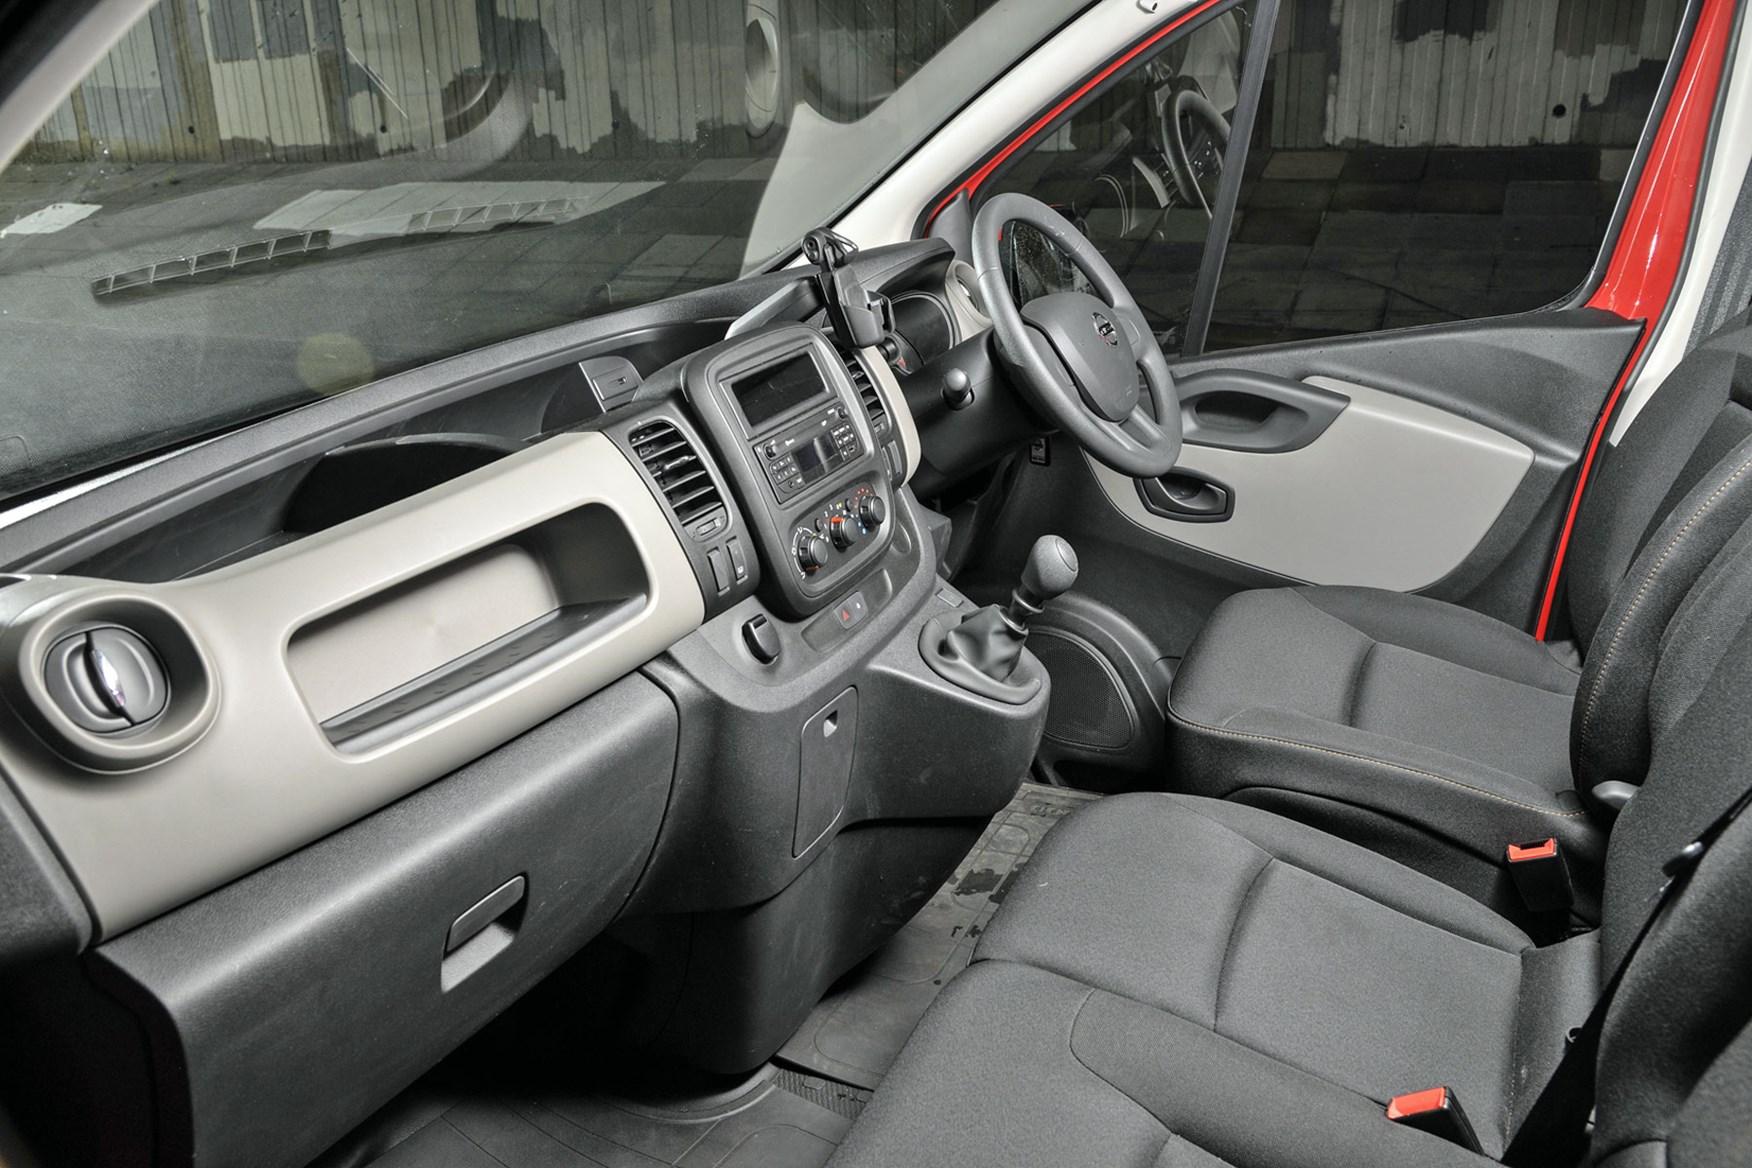 Nissan NV300 - cab interior, dashboard, steering wheel, 2017